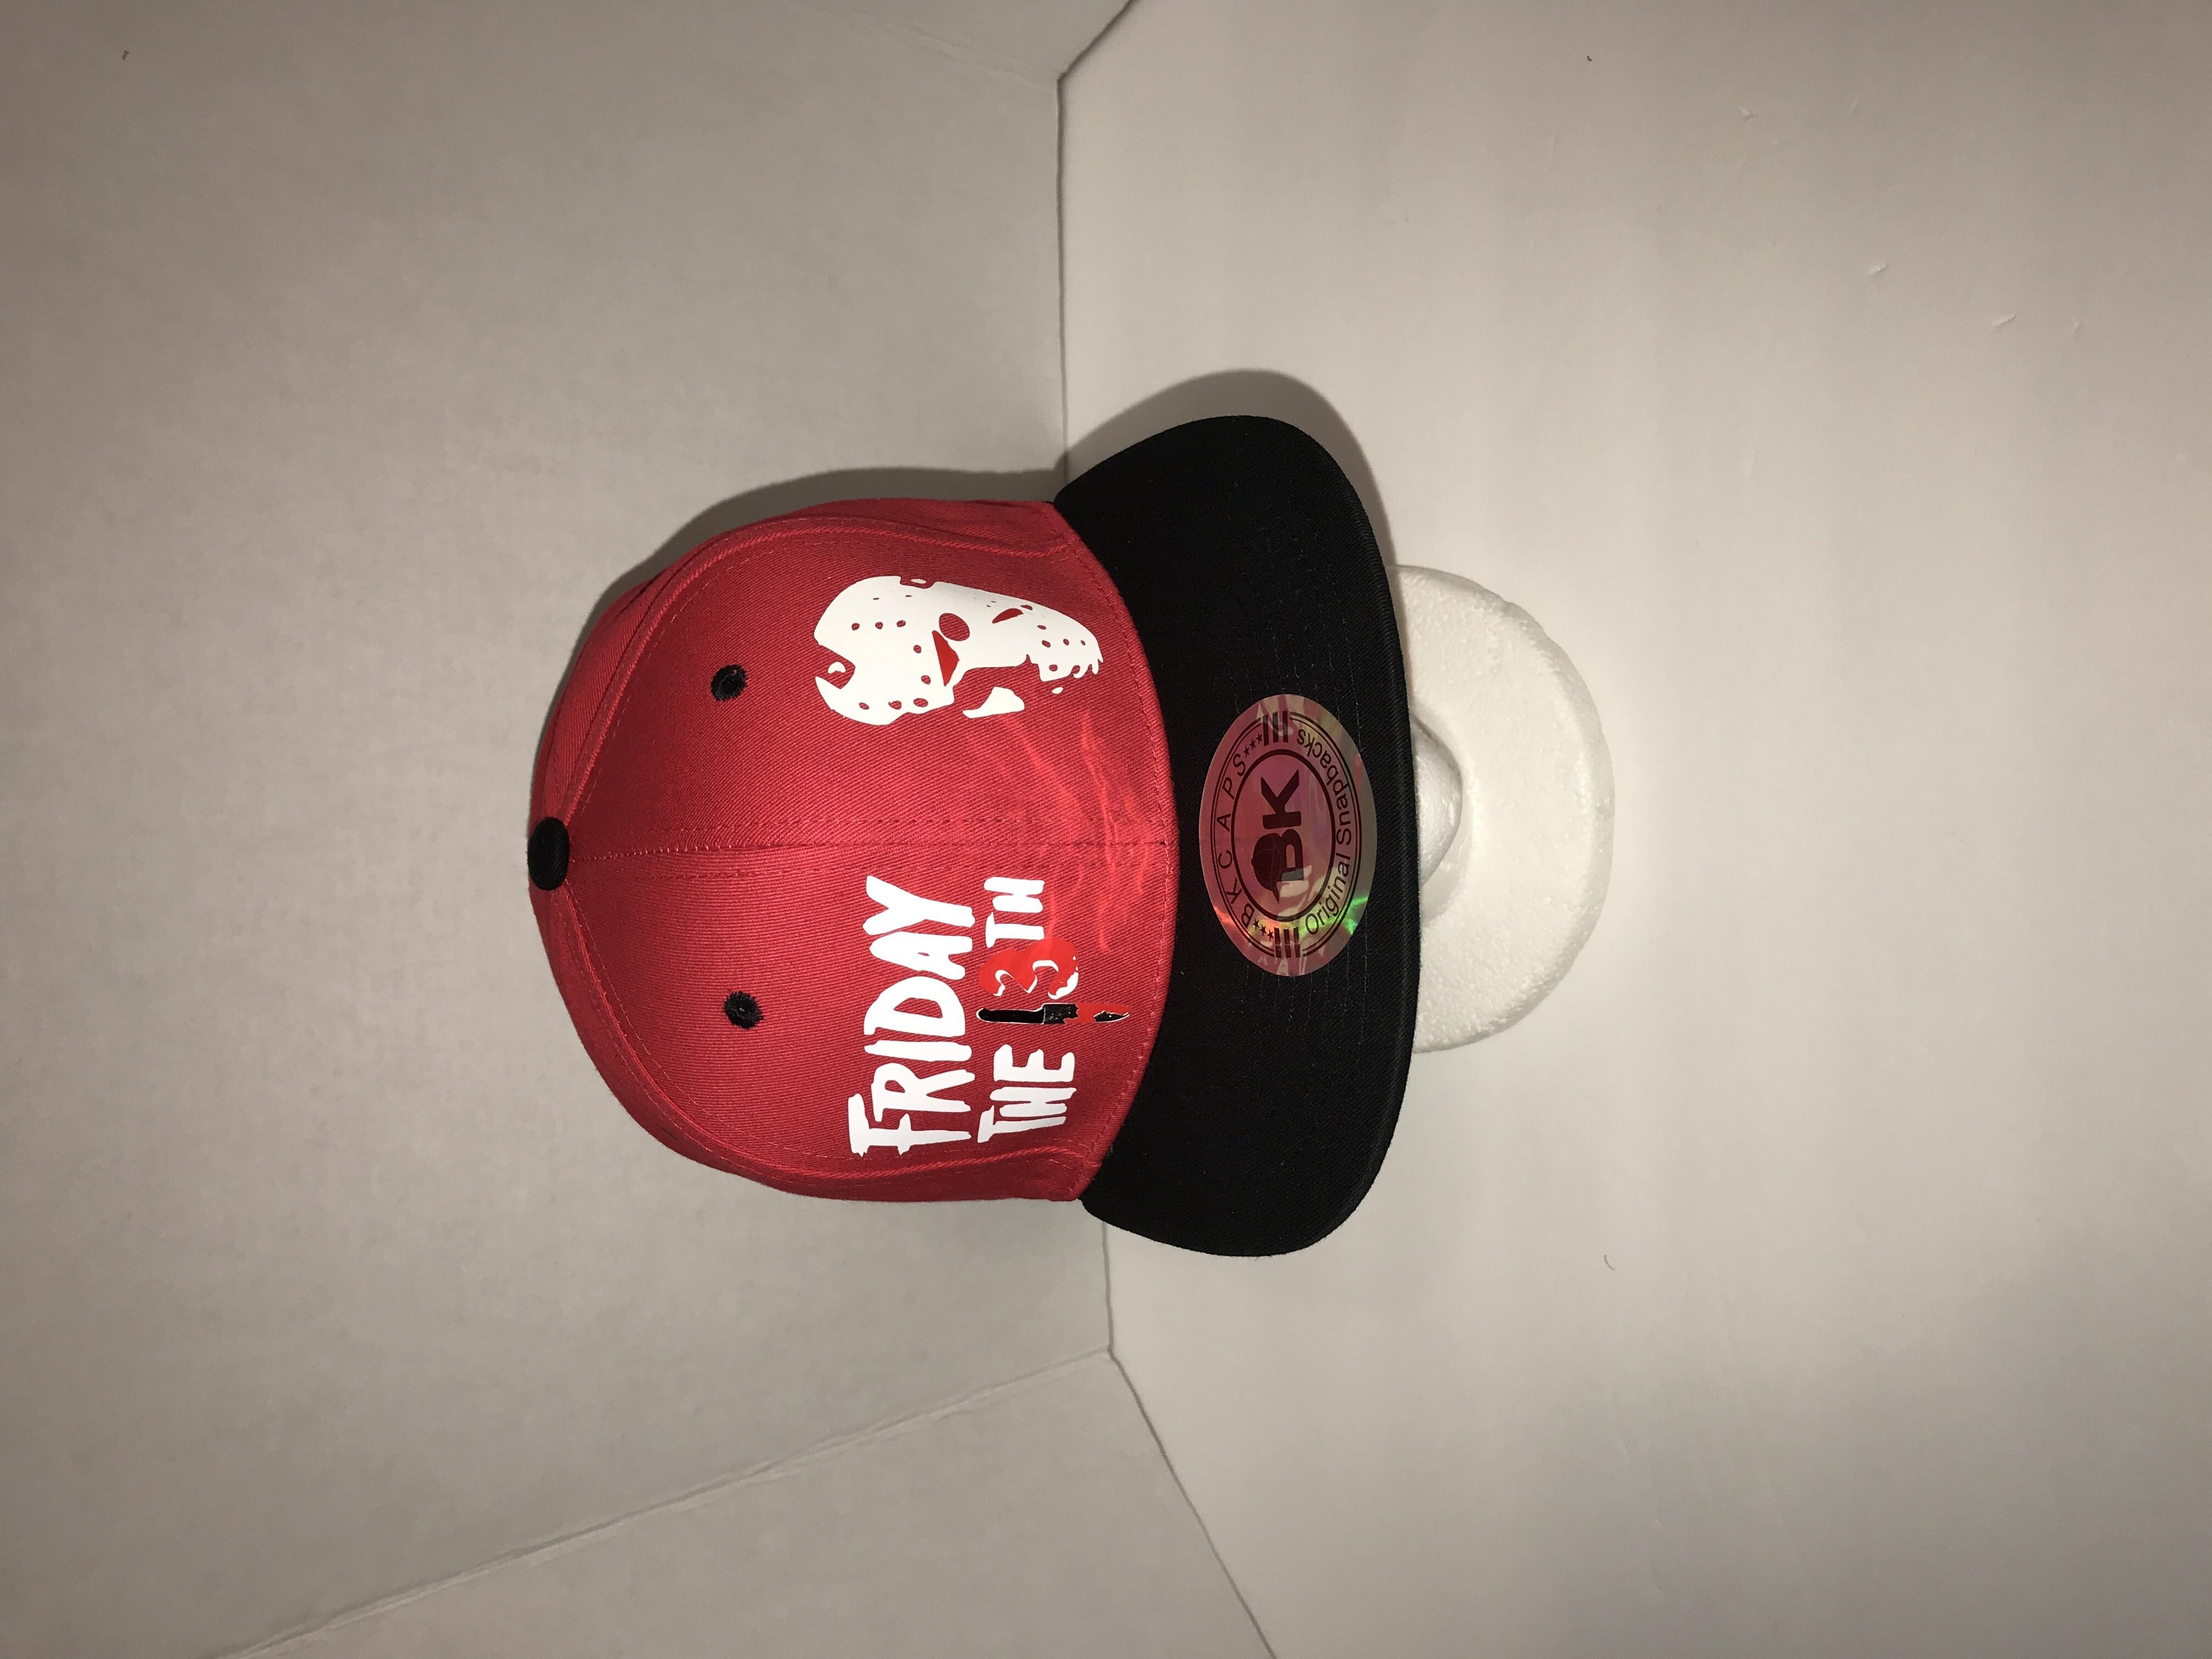 4683ce3b792 Friday the 13th Jason Vorhees snapback Hat BK Caps on Storenvy